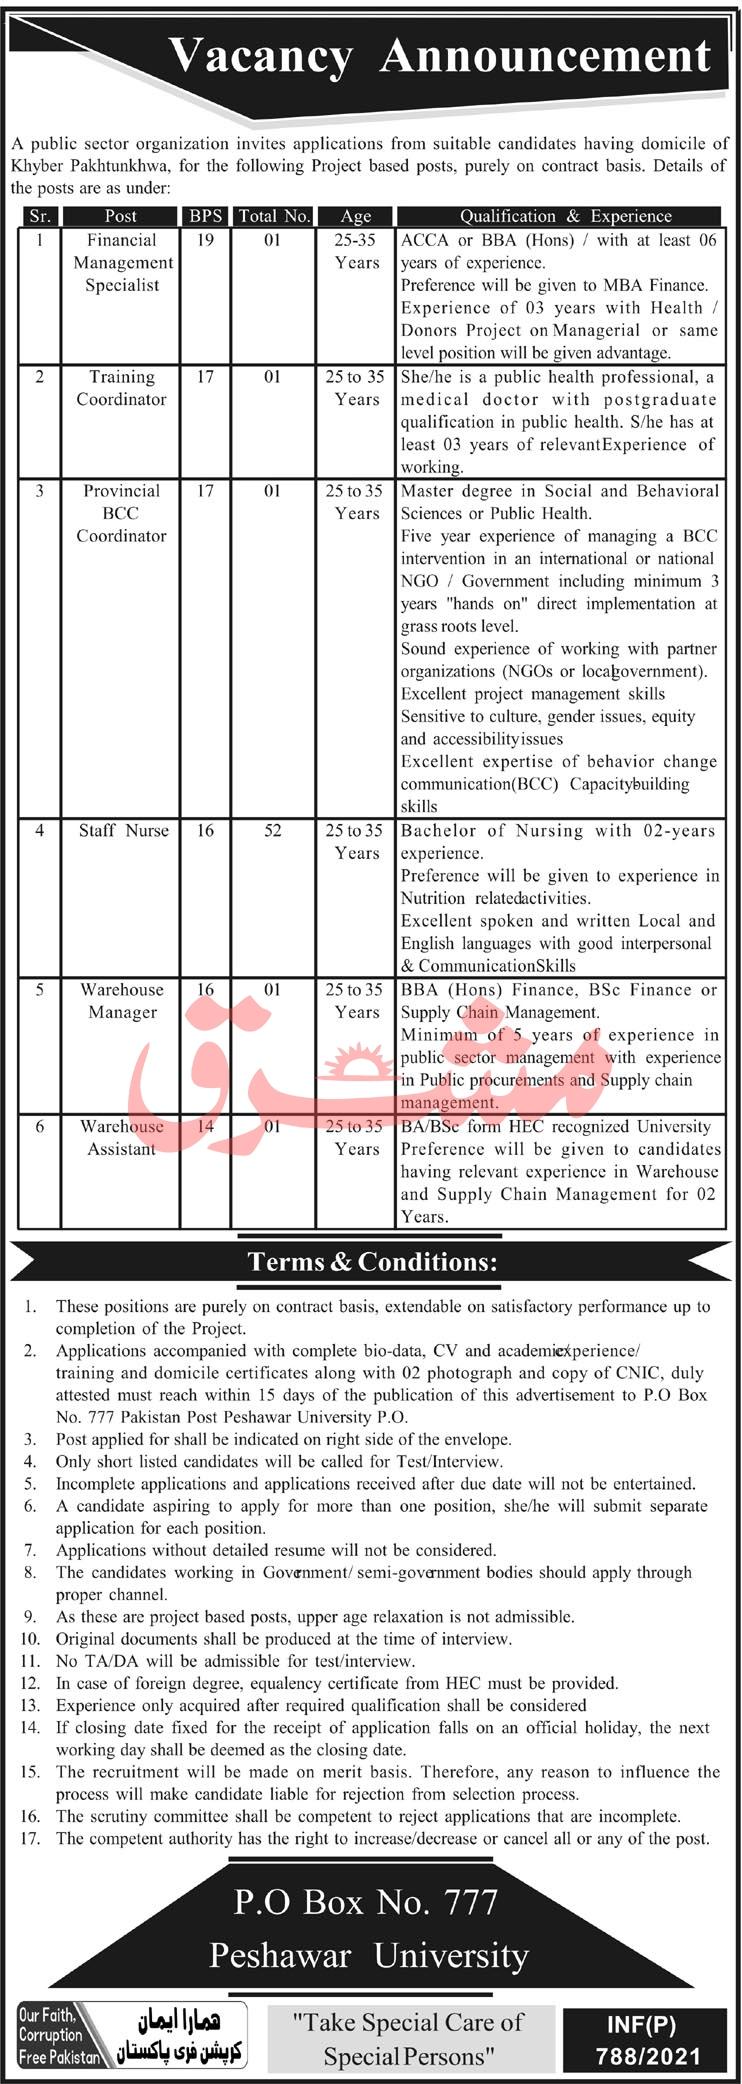 Public Sector Organization PO Box 777 Jobs 2021 in Pakistan - Jobs in Peshawar 2021 - Latest KPK Govt Jobs 2021